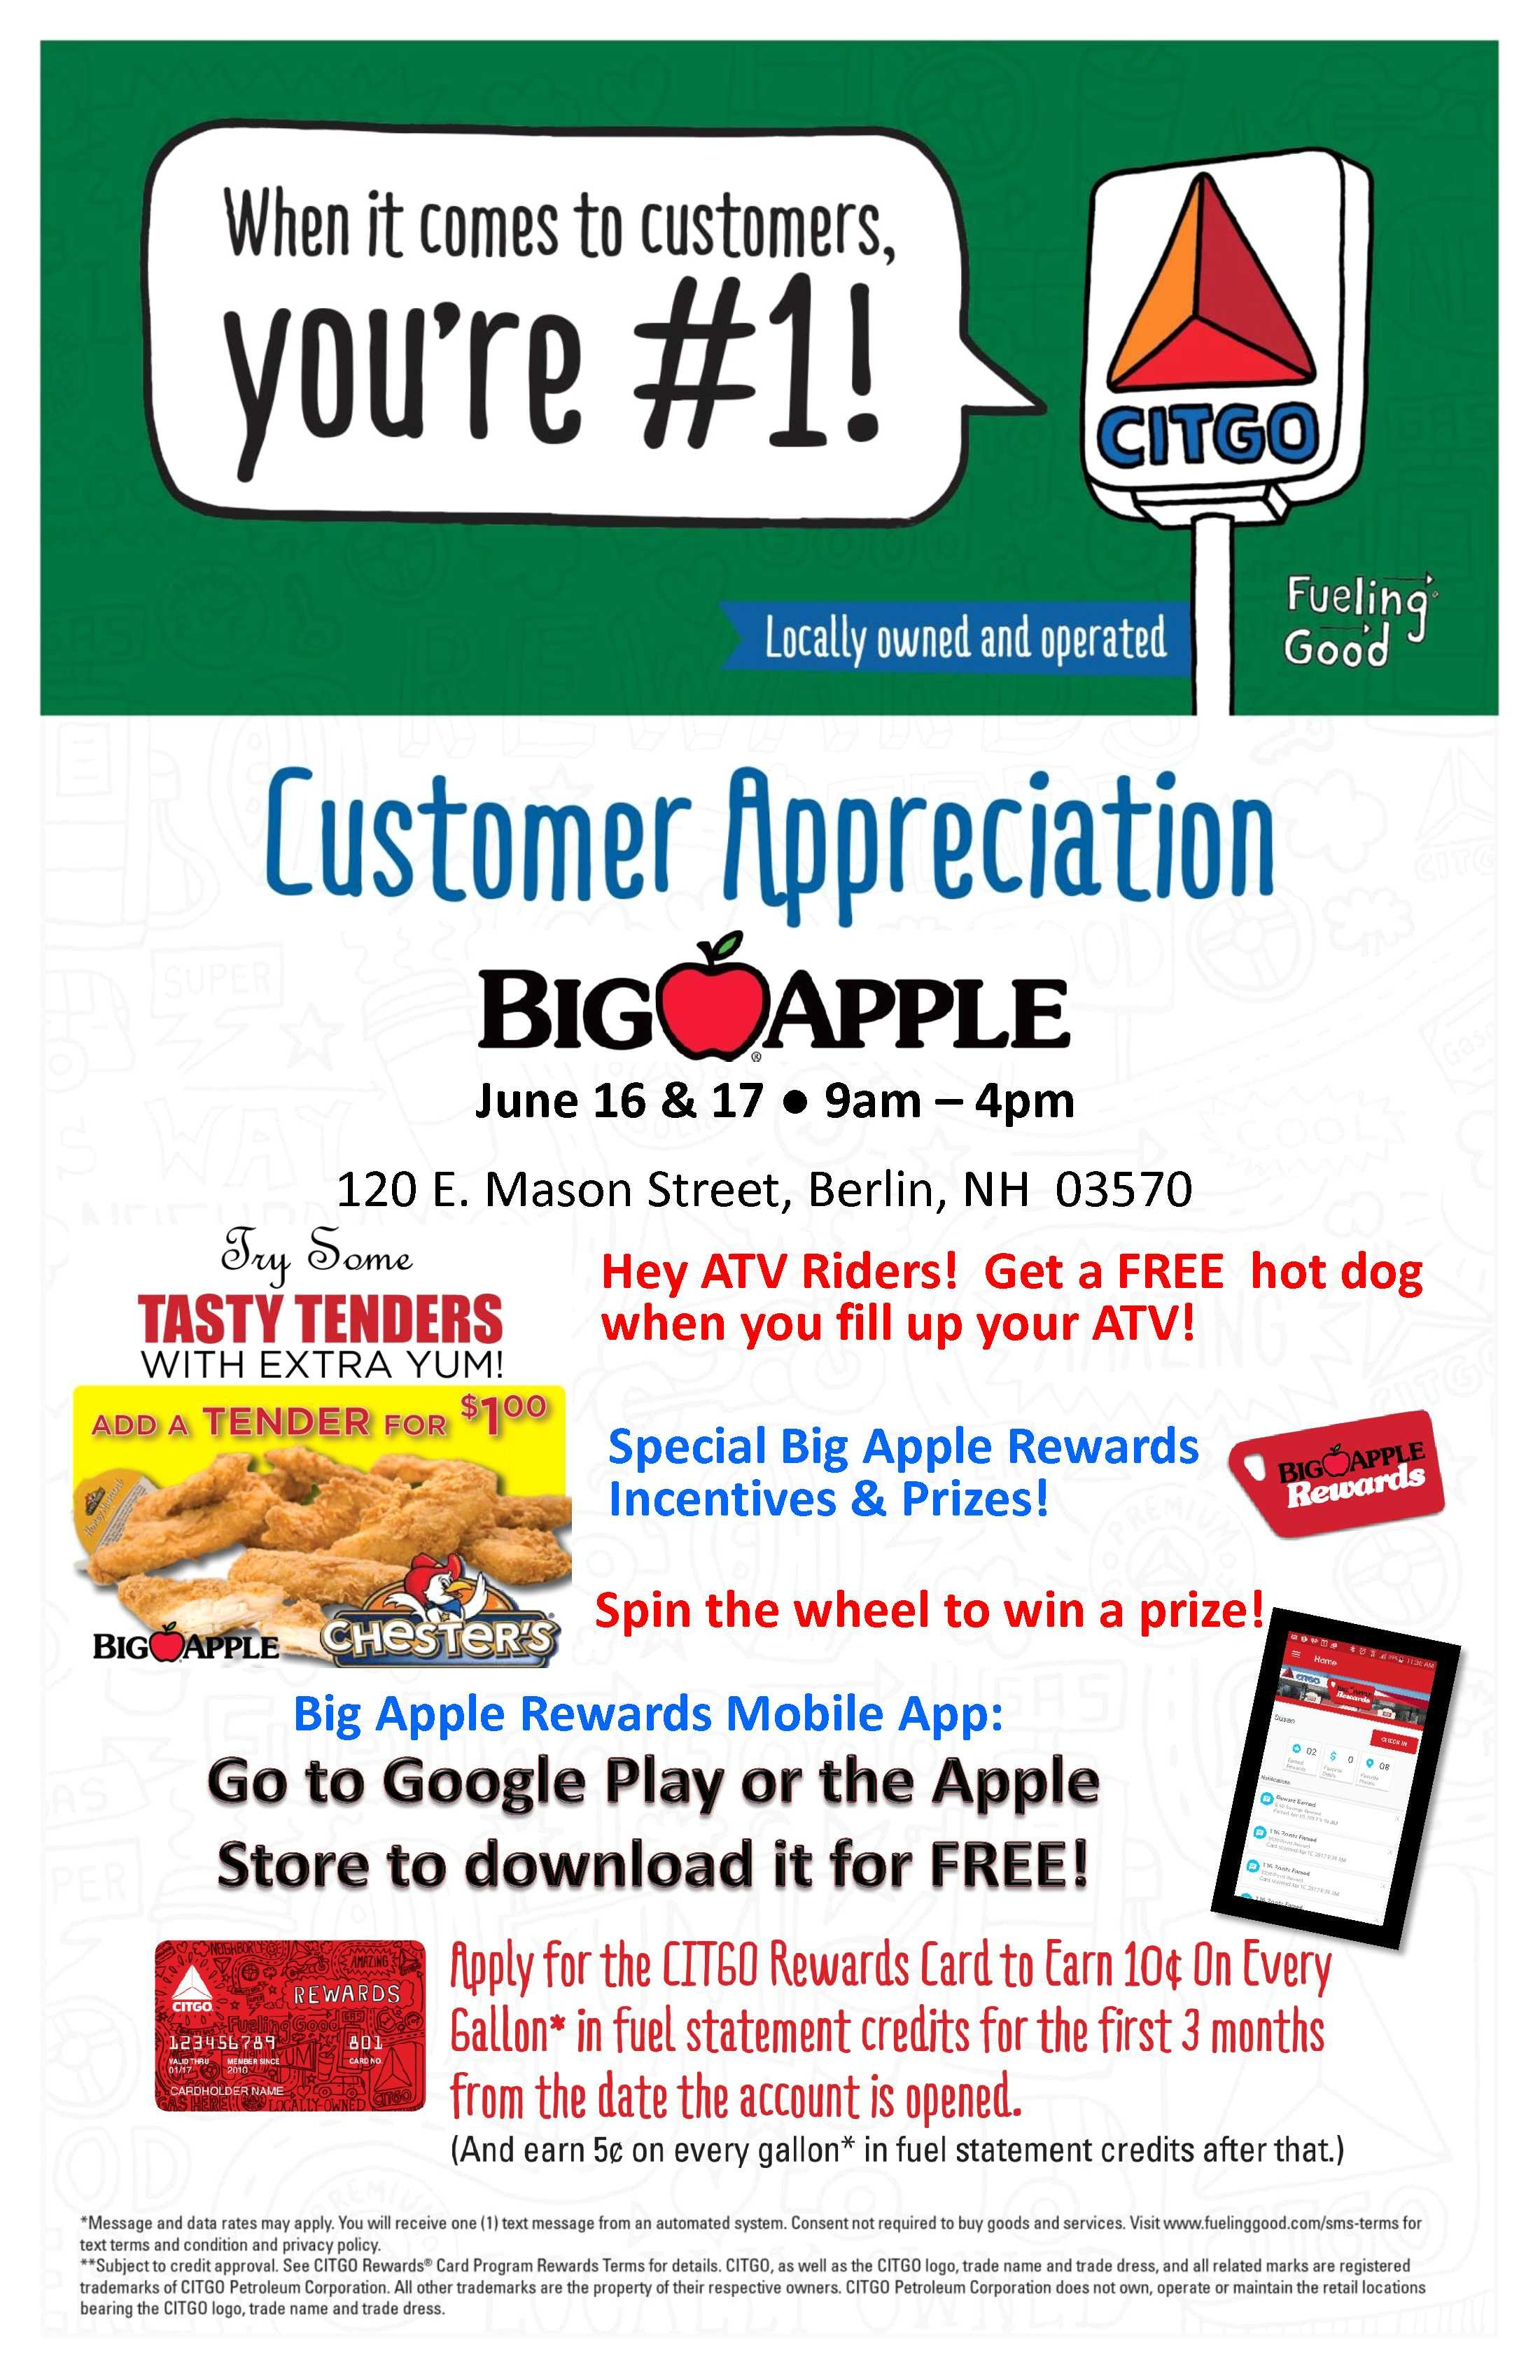 Customer Appreciation Flyer Template Customer Appreciation event Berlin Nh Cnbrown Big Apple